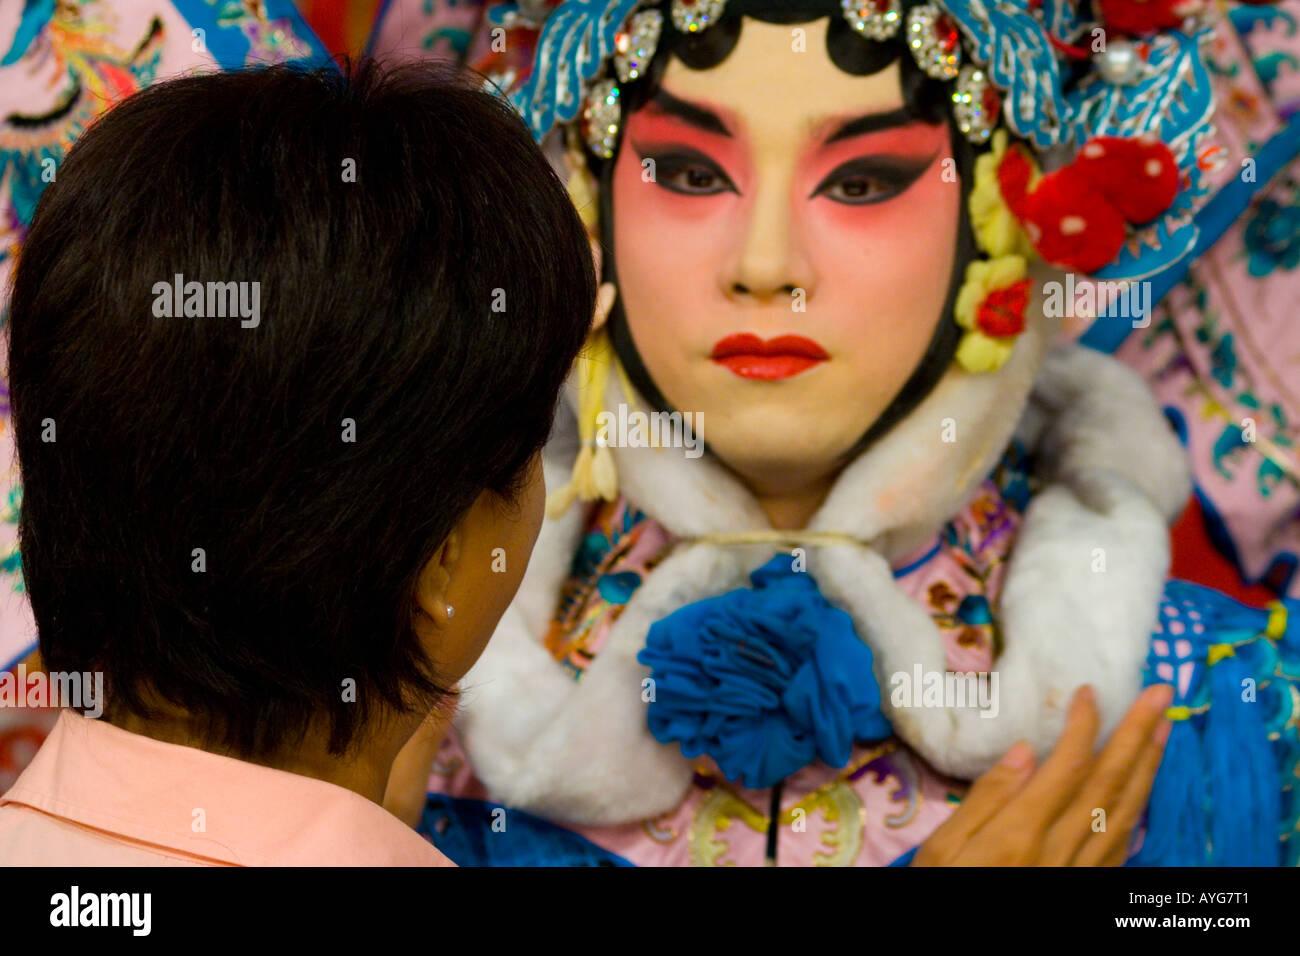 Fixing Makeup on Stage Zhengyici Peking Opera House Beijing China